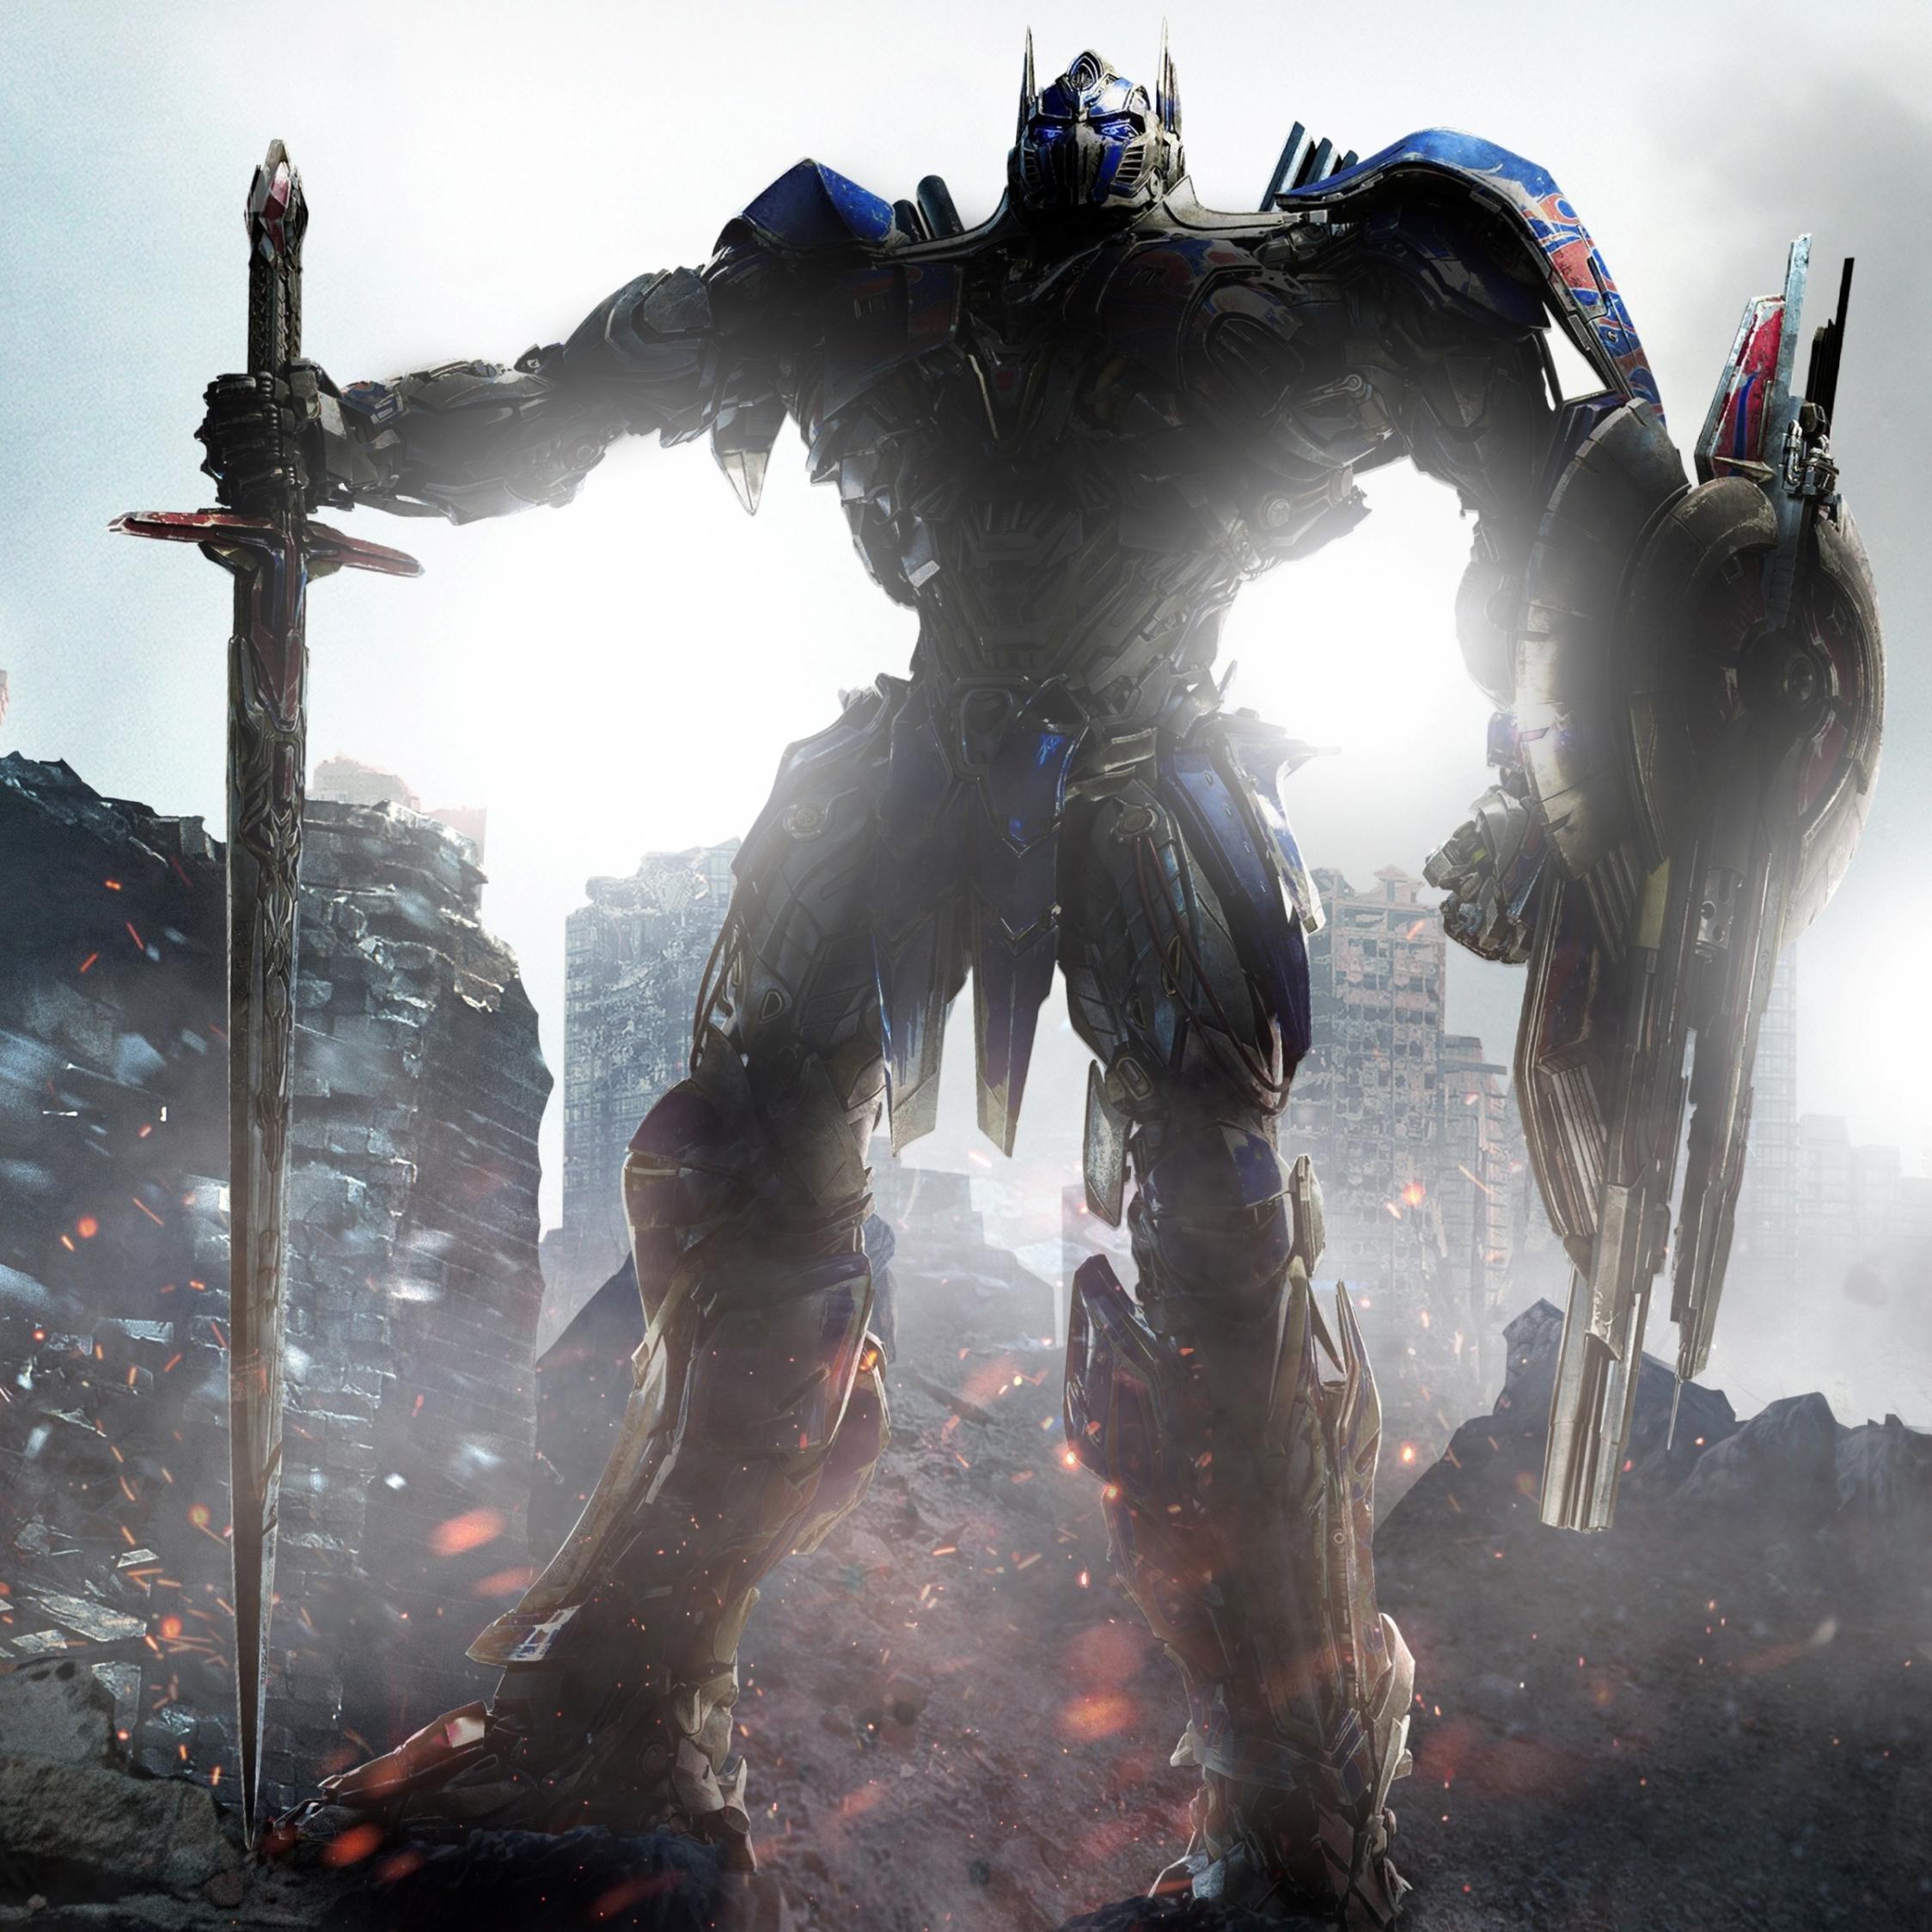 Optimus Prime Wallpaper Hd: Optimus Prime Transformers The Last Knight, HD 4K Wallpaper